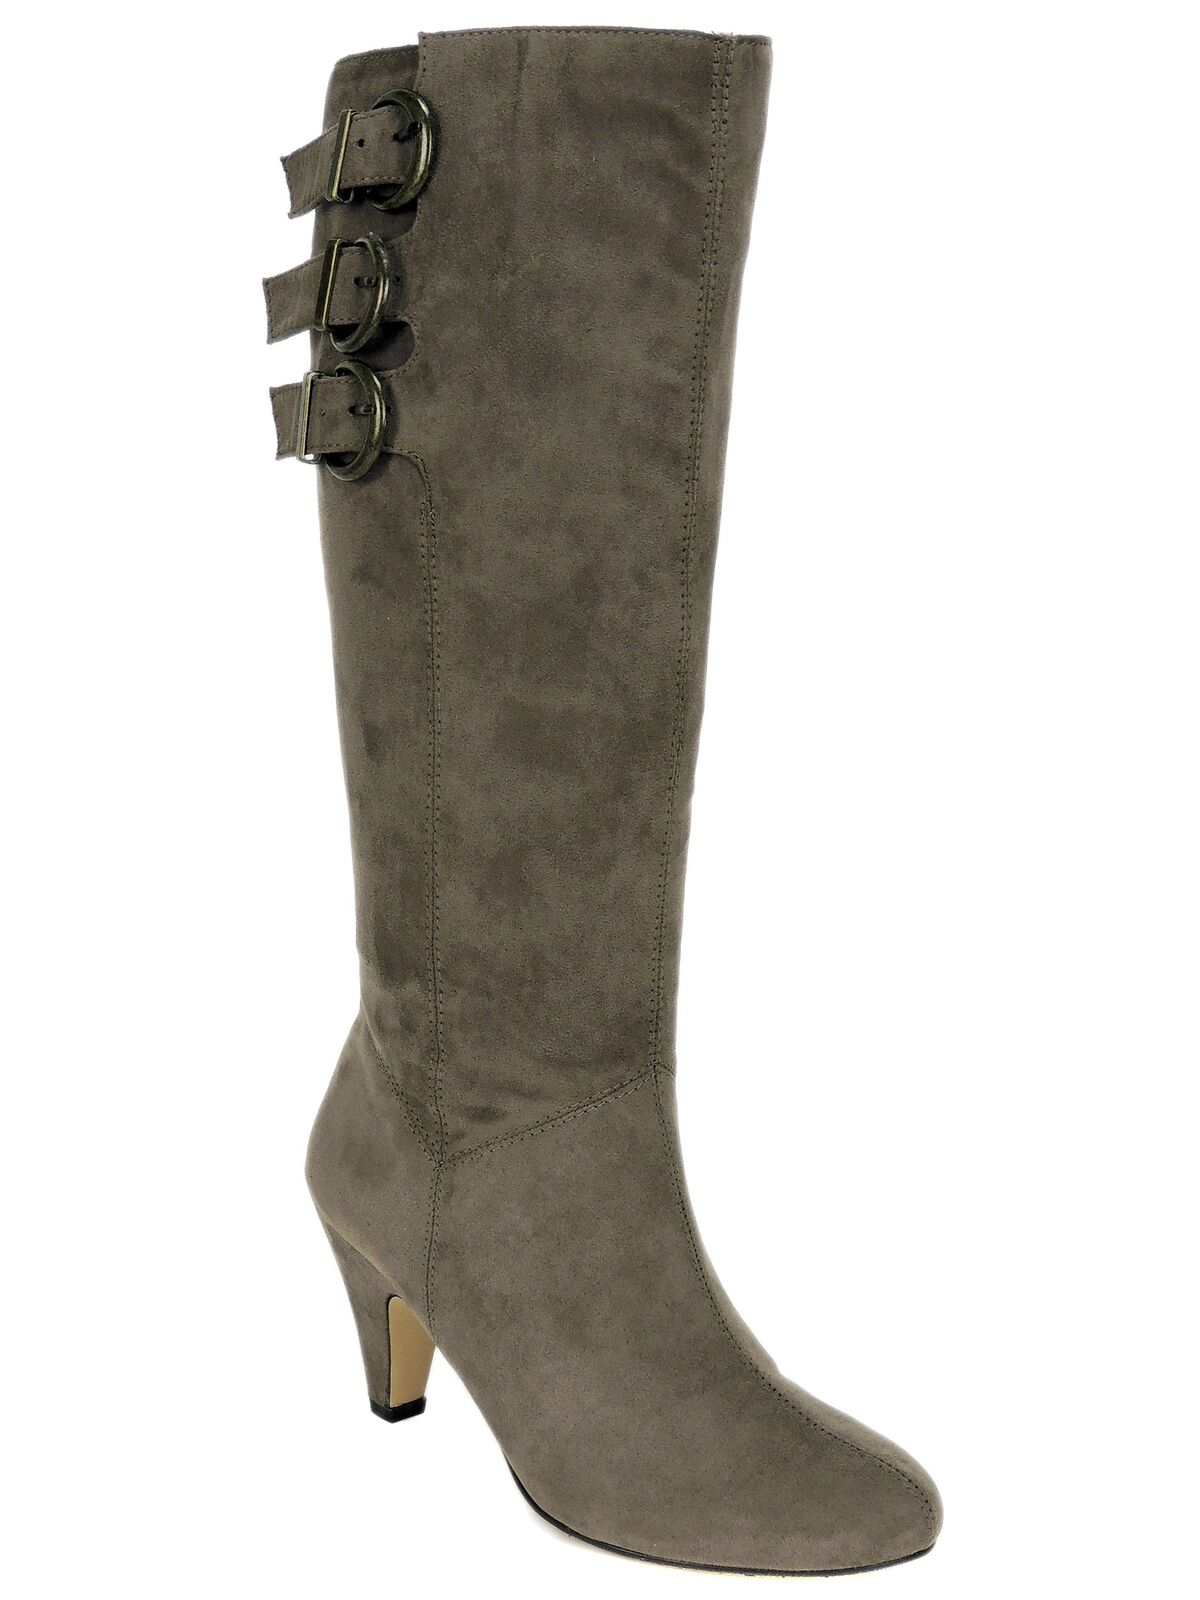 Bella Vita Women's Transit II Boots Taupe Faux Suede Size 7 M